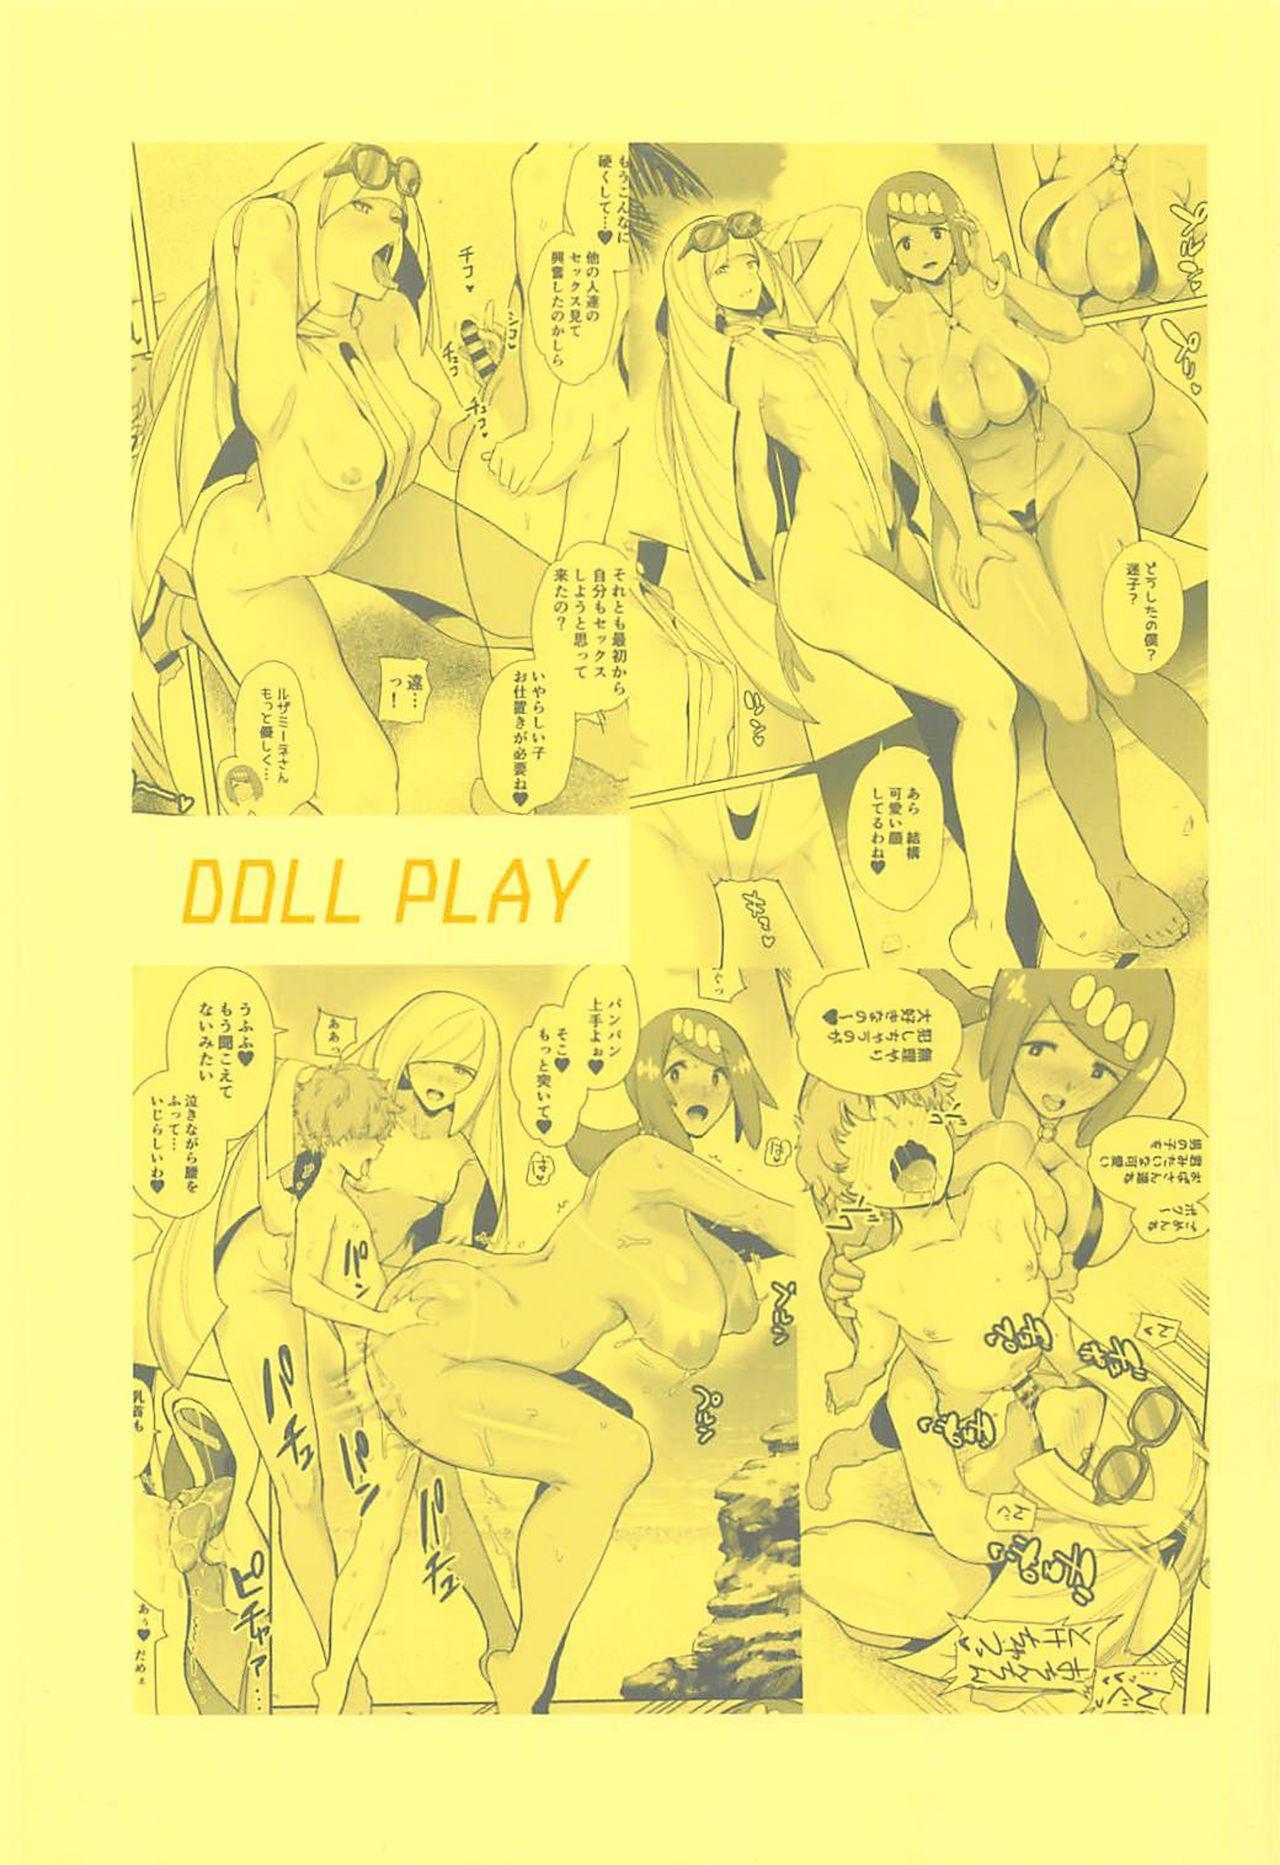 (SC2019 Spring) [DOLL PLAY (Kurosu Gatari)] Alola no Yoru no Sugata 3 (Pokémon Sun and Moon)   The Feeling of Alolan Night 3 [English] [Learn JP With H] 25